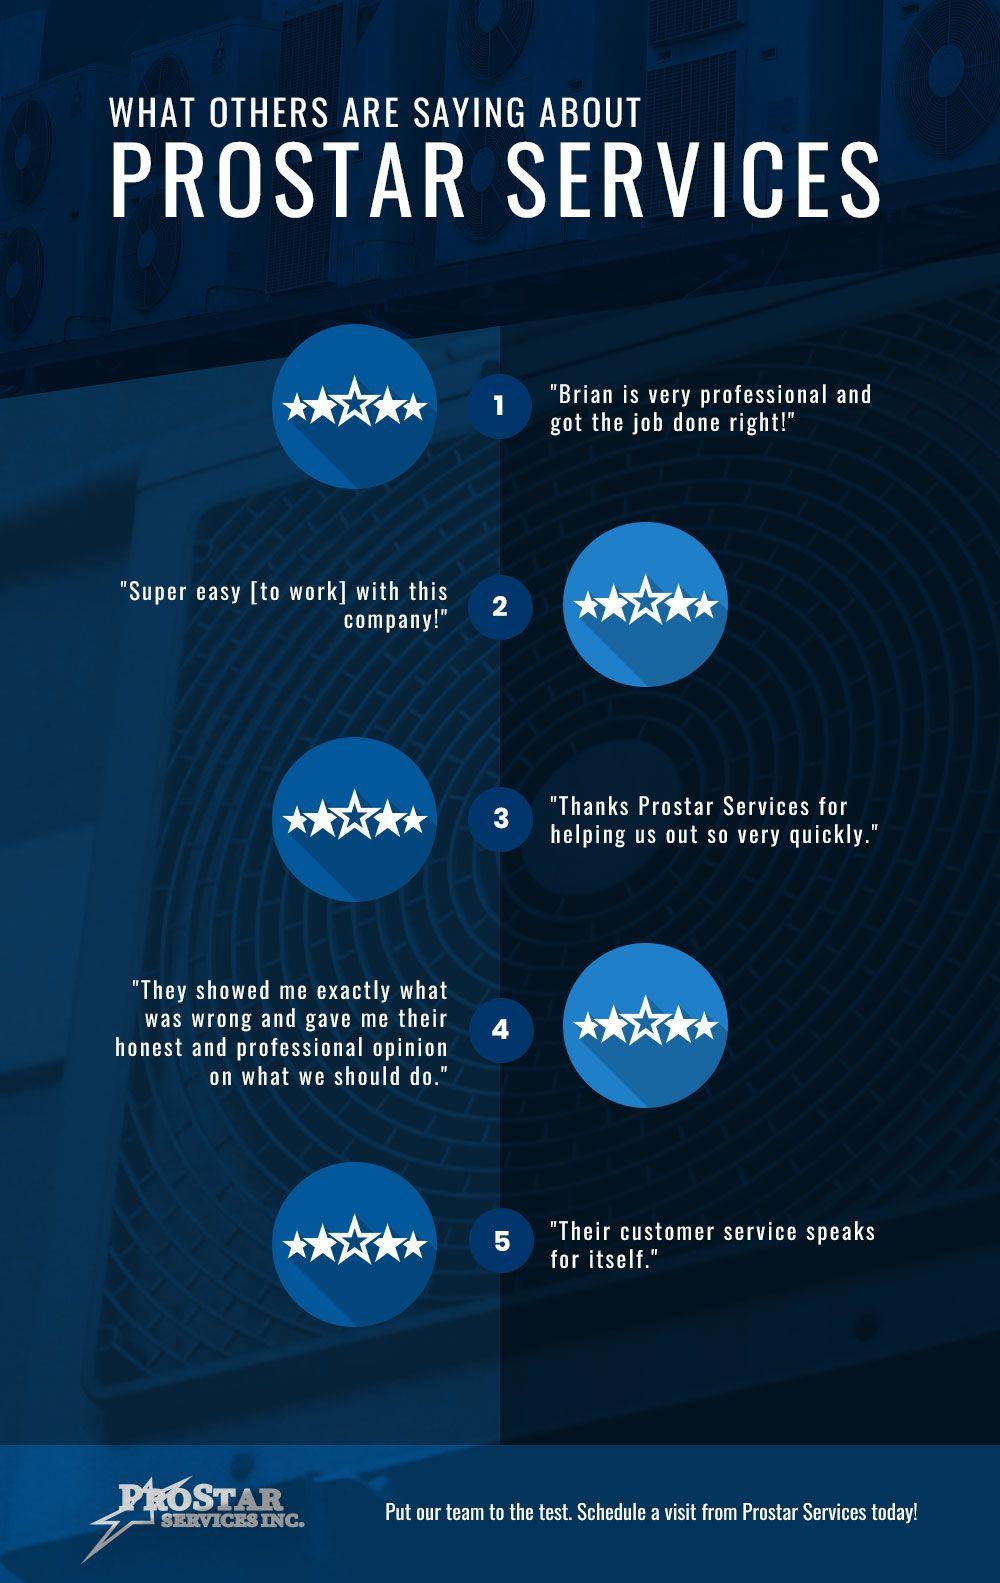 whatothersaresaying-infographic.jpg